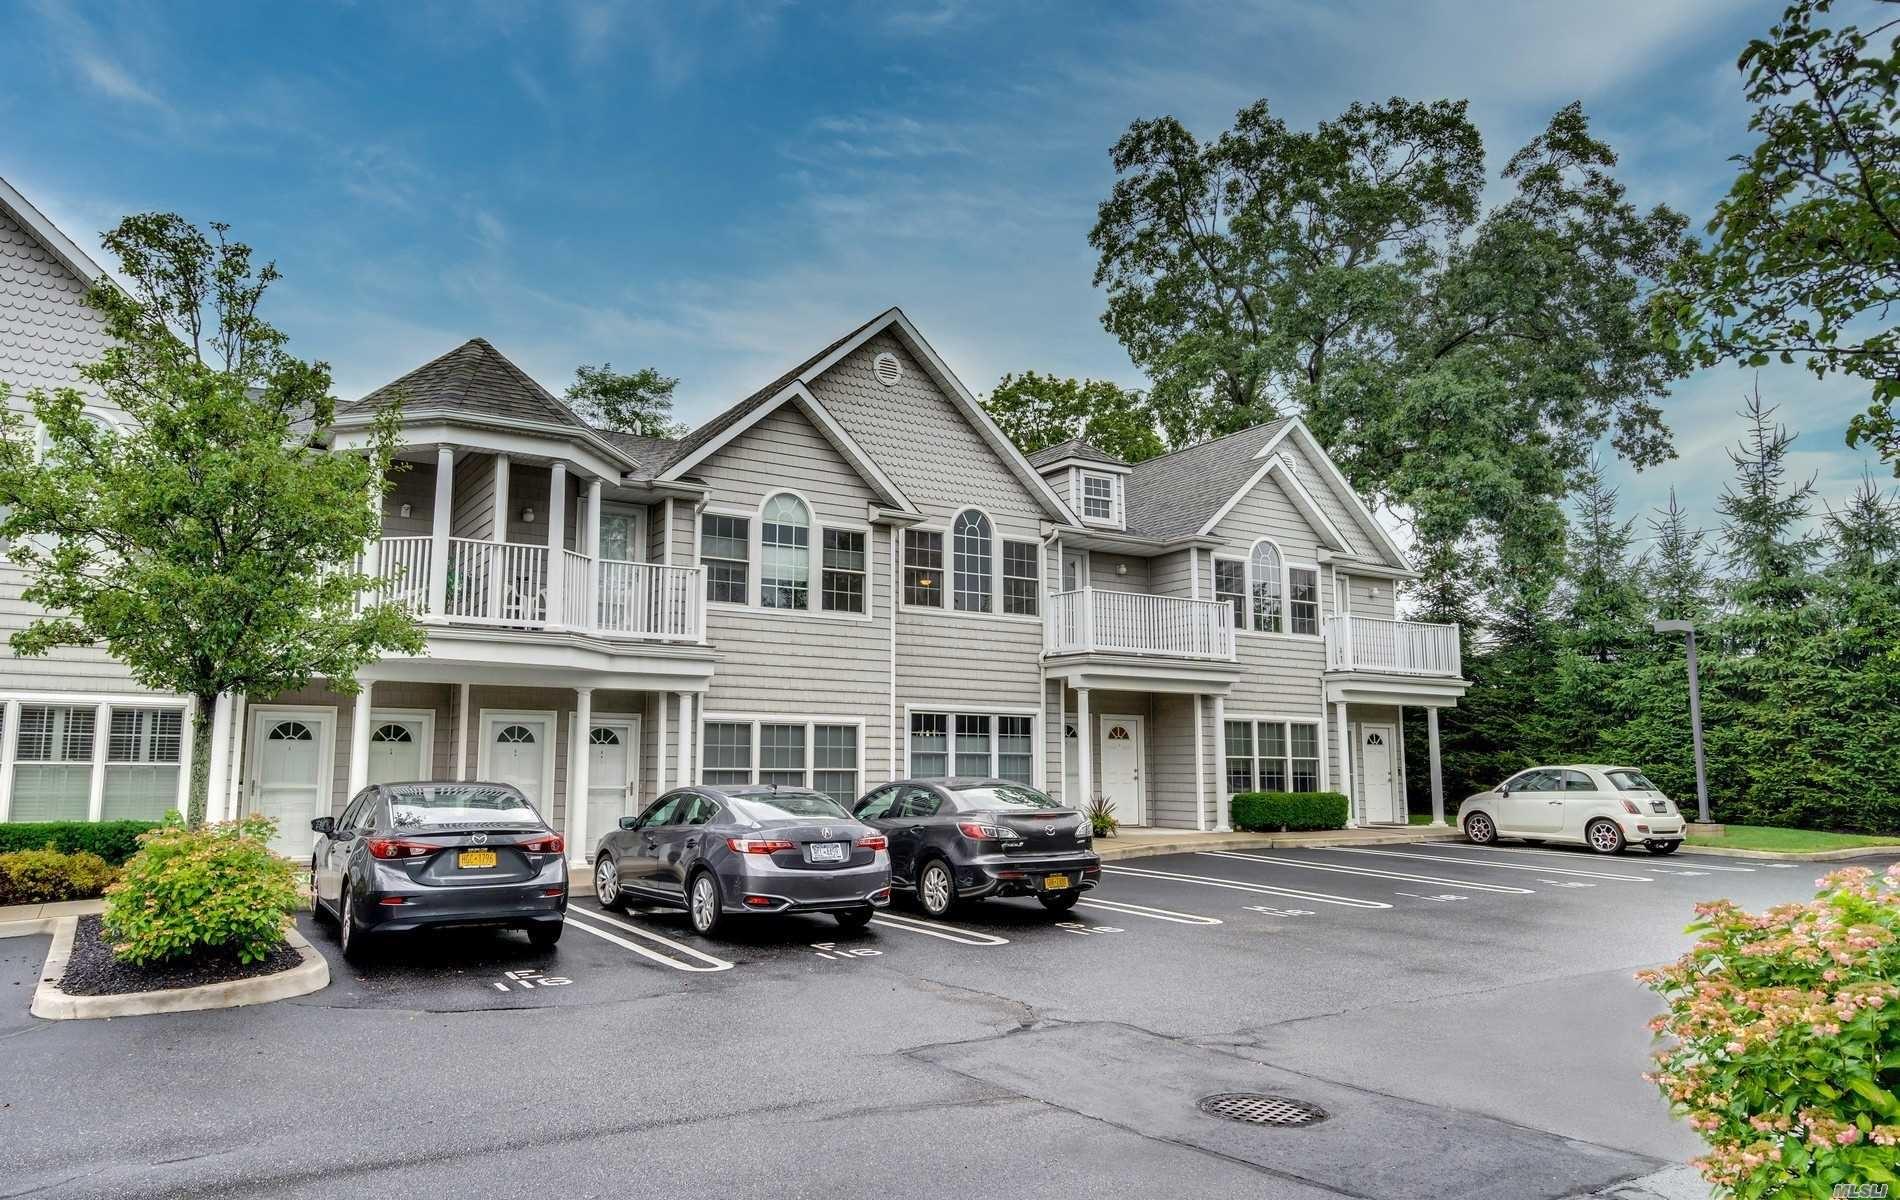 116 Stewart Avenue #J, Bethpage, NY 11714 - MLS#: 3239279